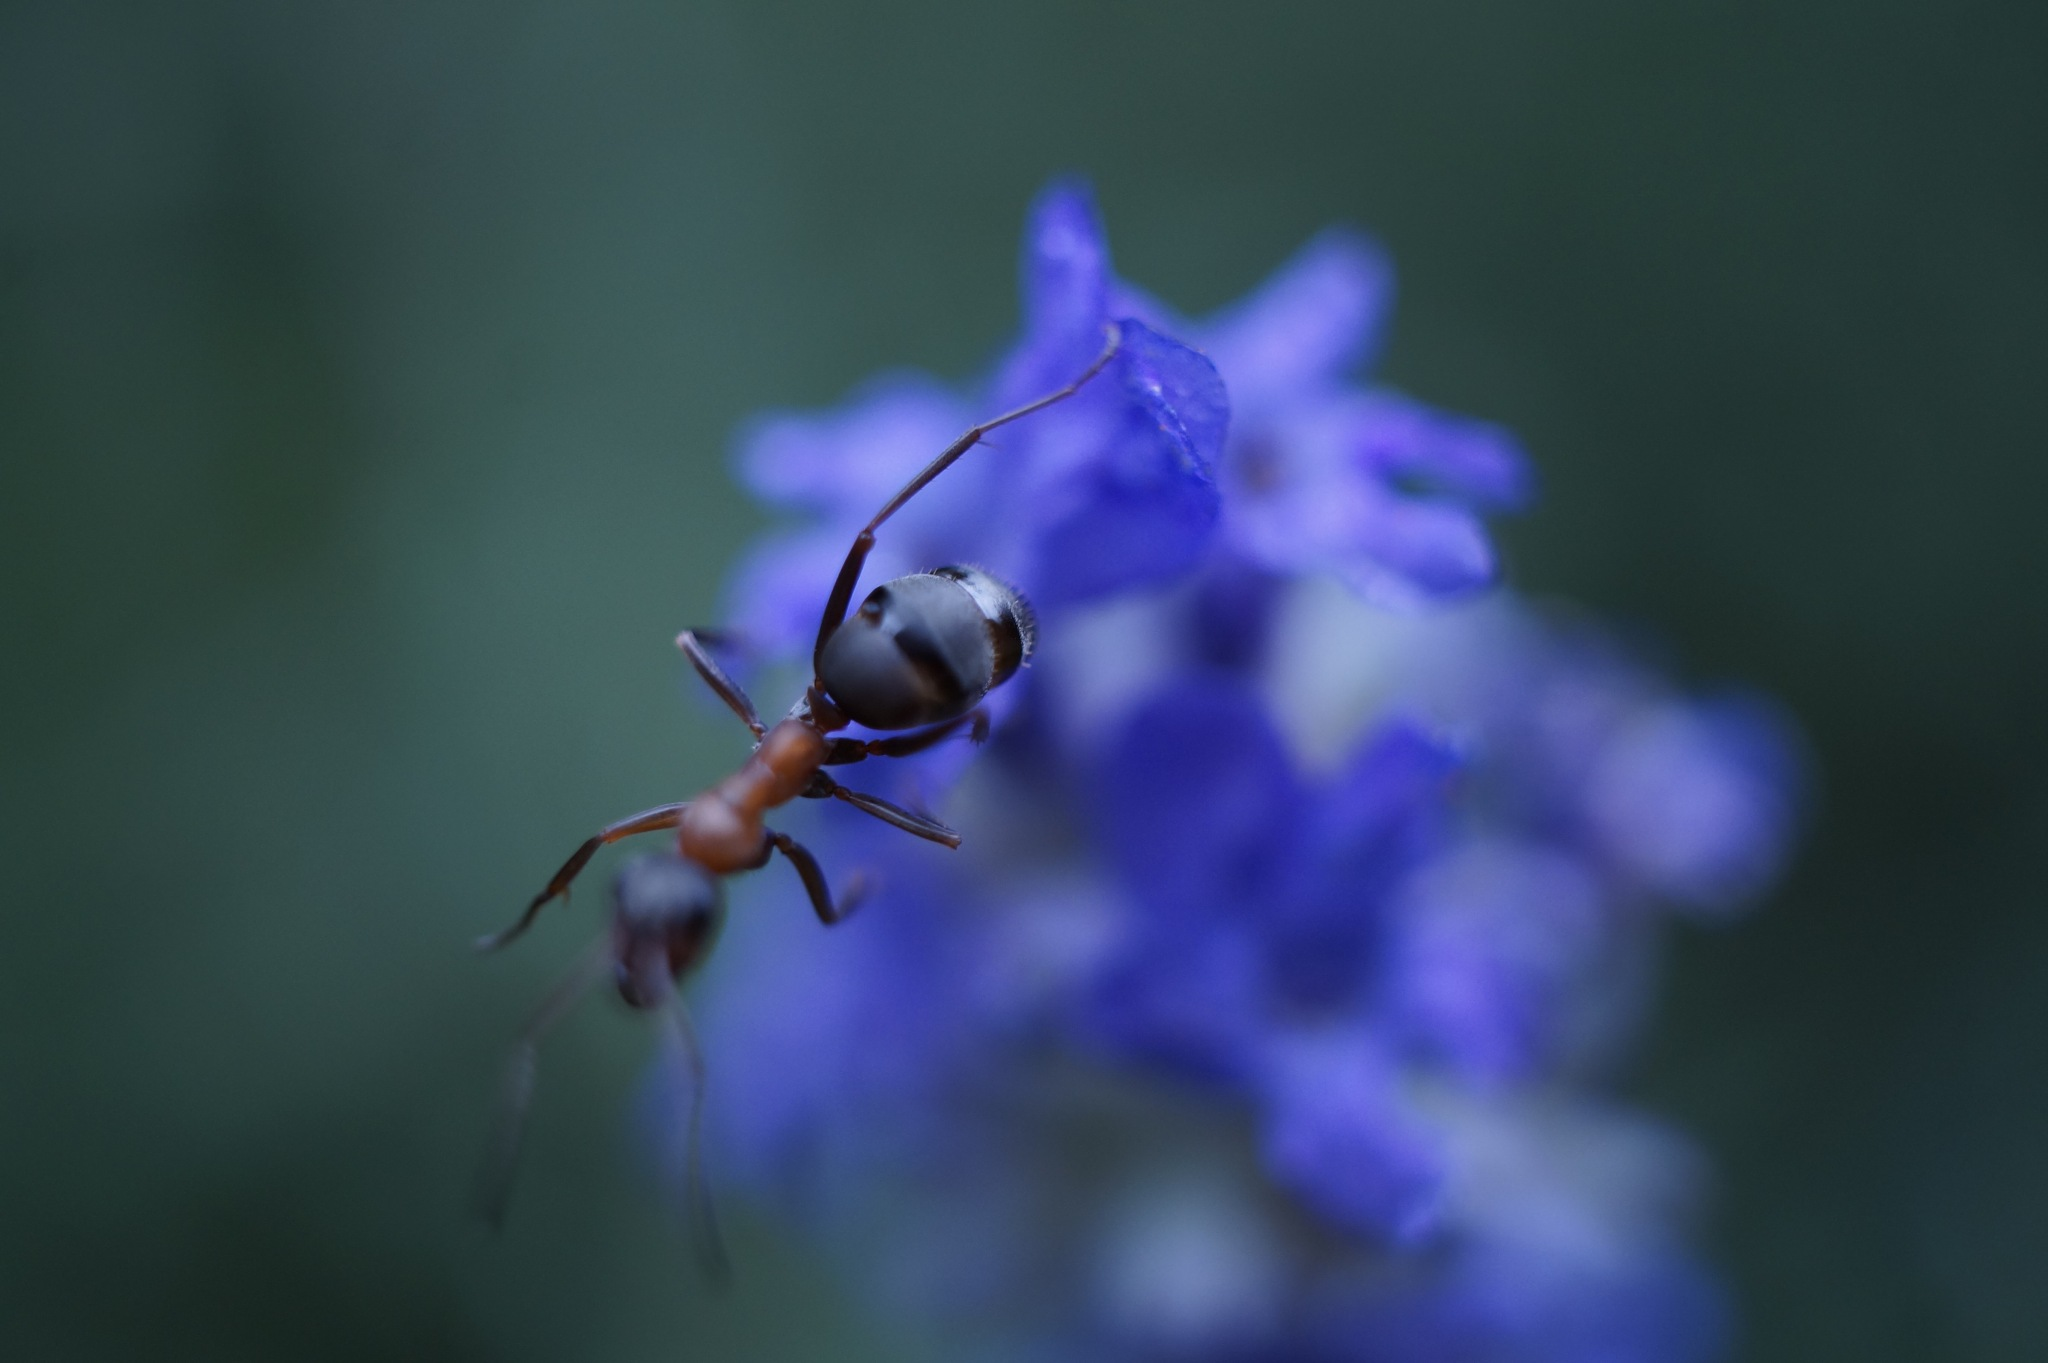 ant by Burak Demir